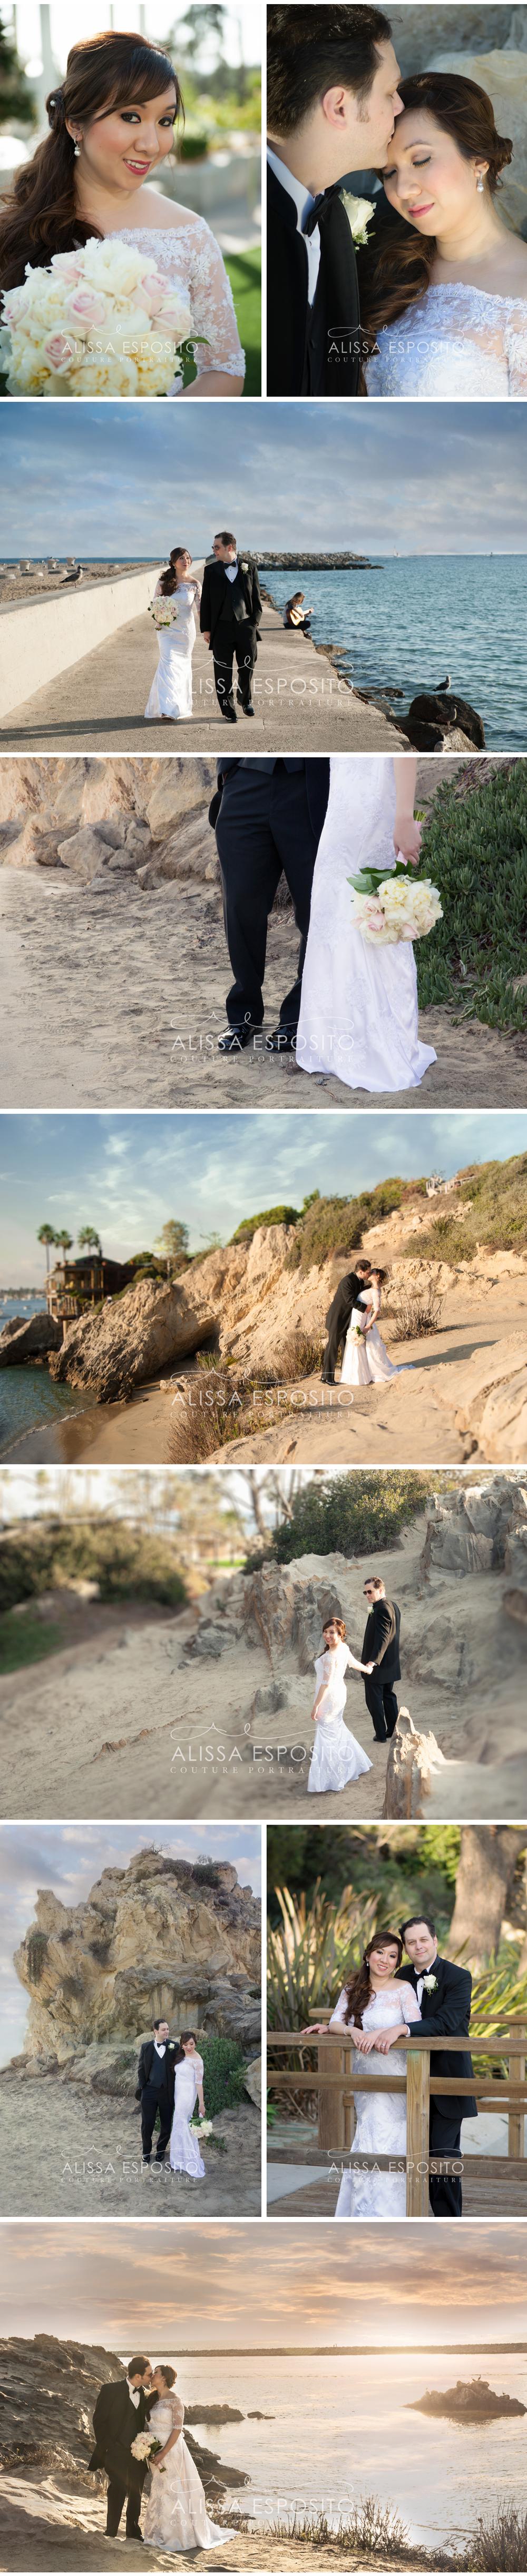 Beach Wedding, Newport Beach, California, Southern California Wedding Photographer, Alissa Esposito Photography | www.alissaesposito.com